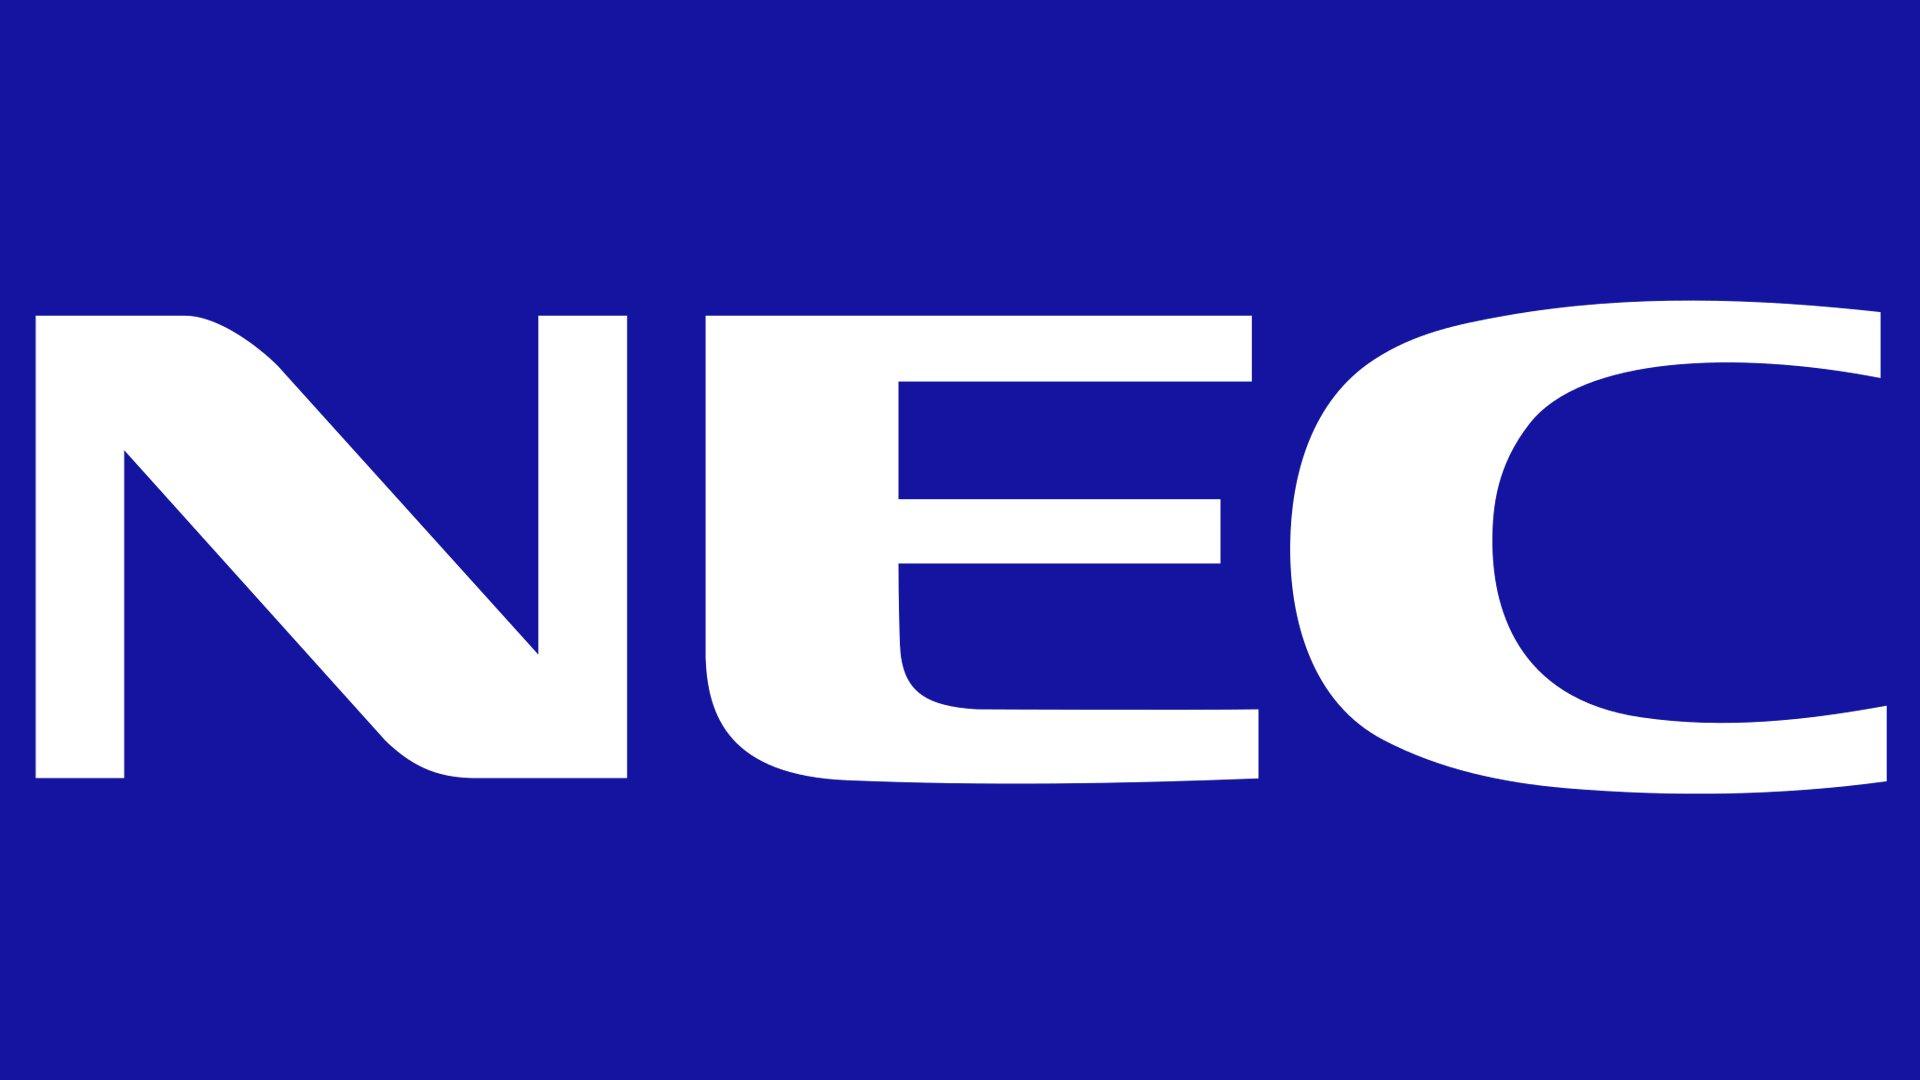 Car Companies Logos >> NEC Logo, NEC Symbol, Meaning, History and Evolution